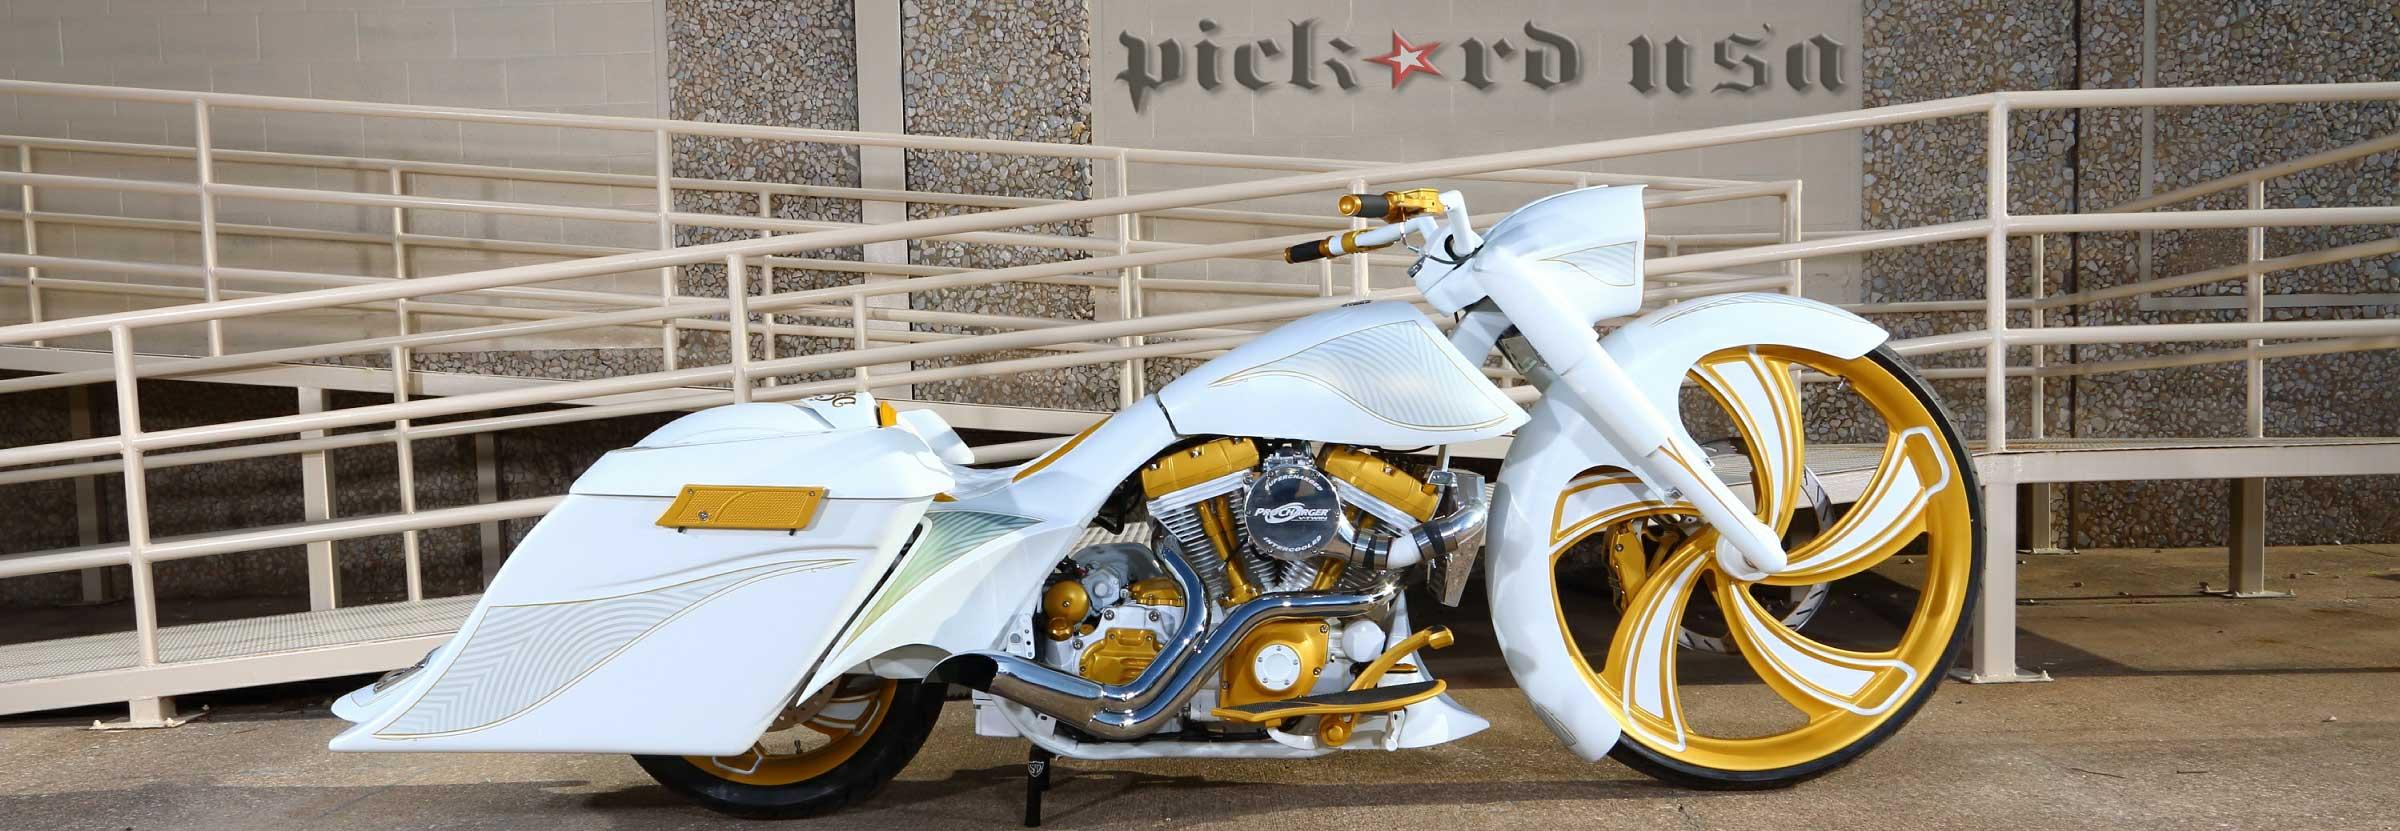 Custom Harley Baggers